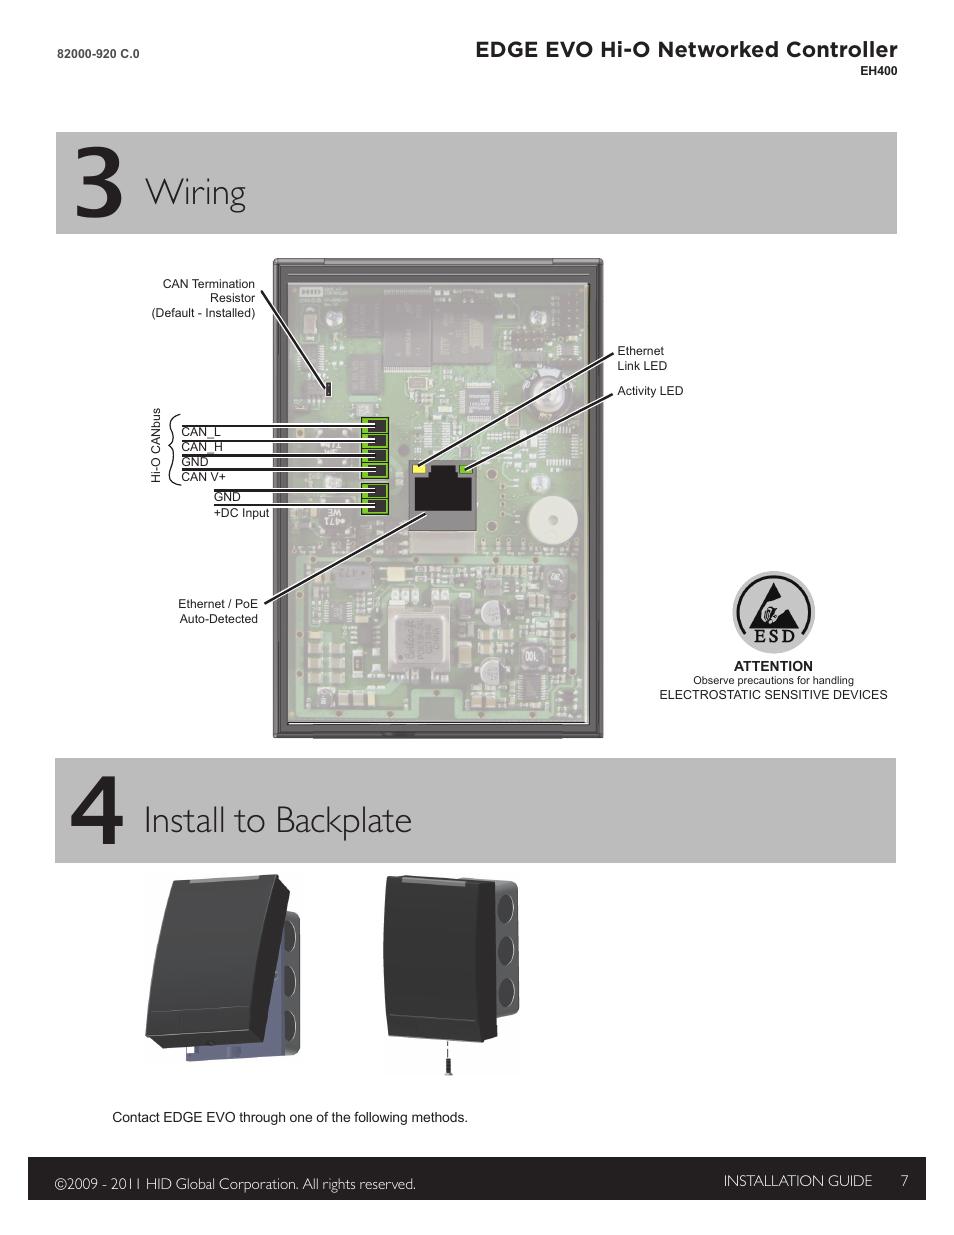 Hid Edge Eh400 Wiring Diagram - House Wiring Diagram Symbols •